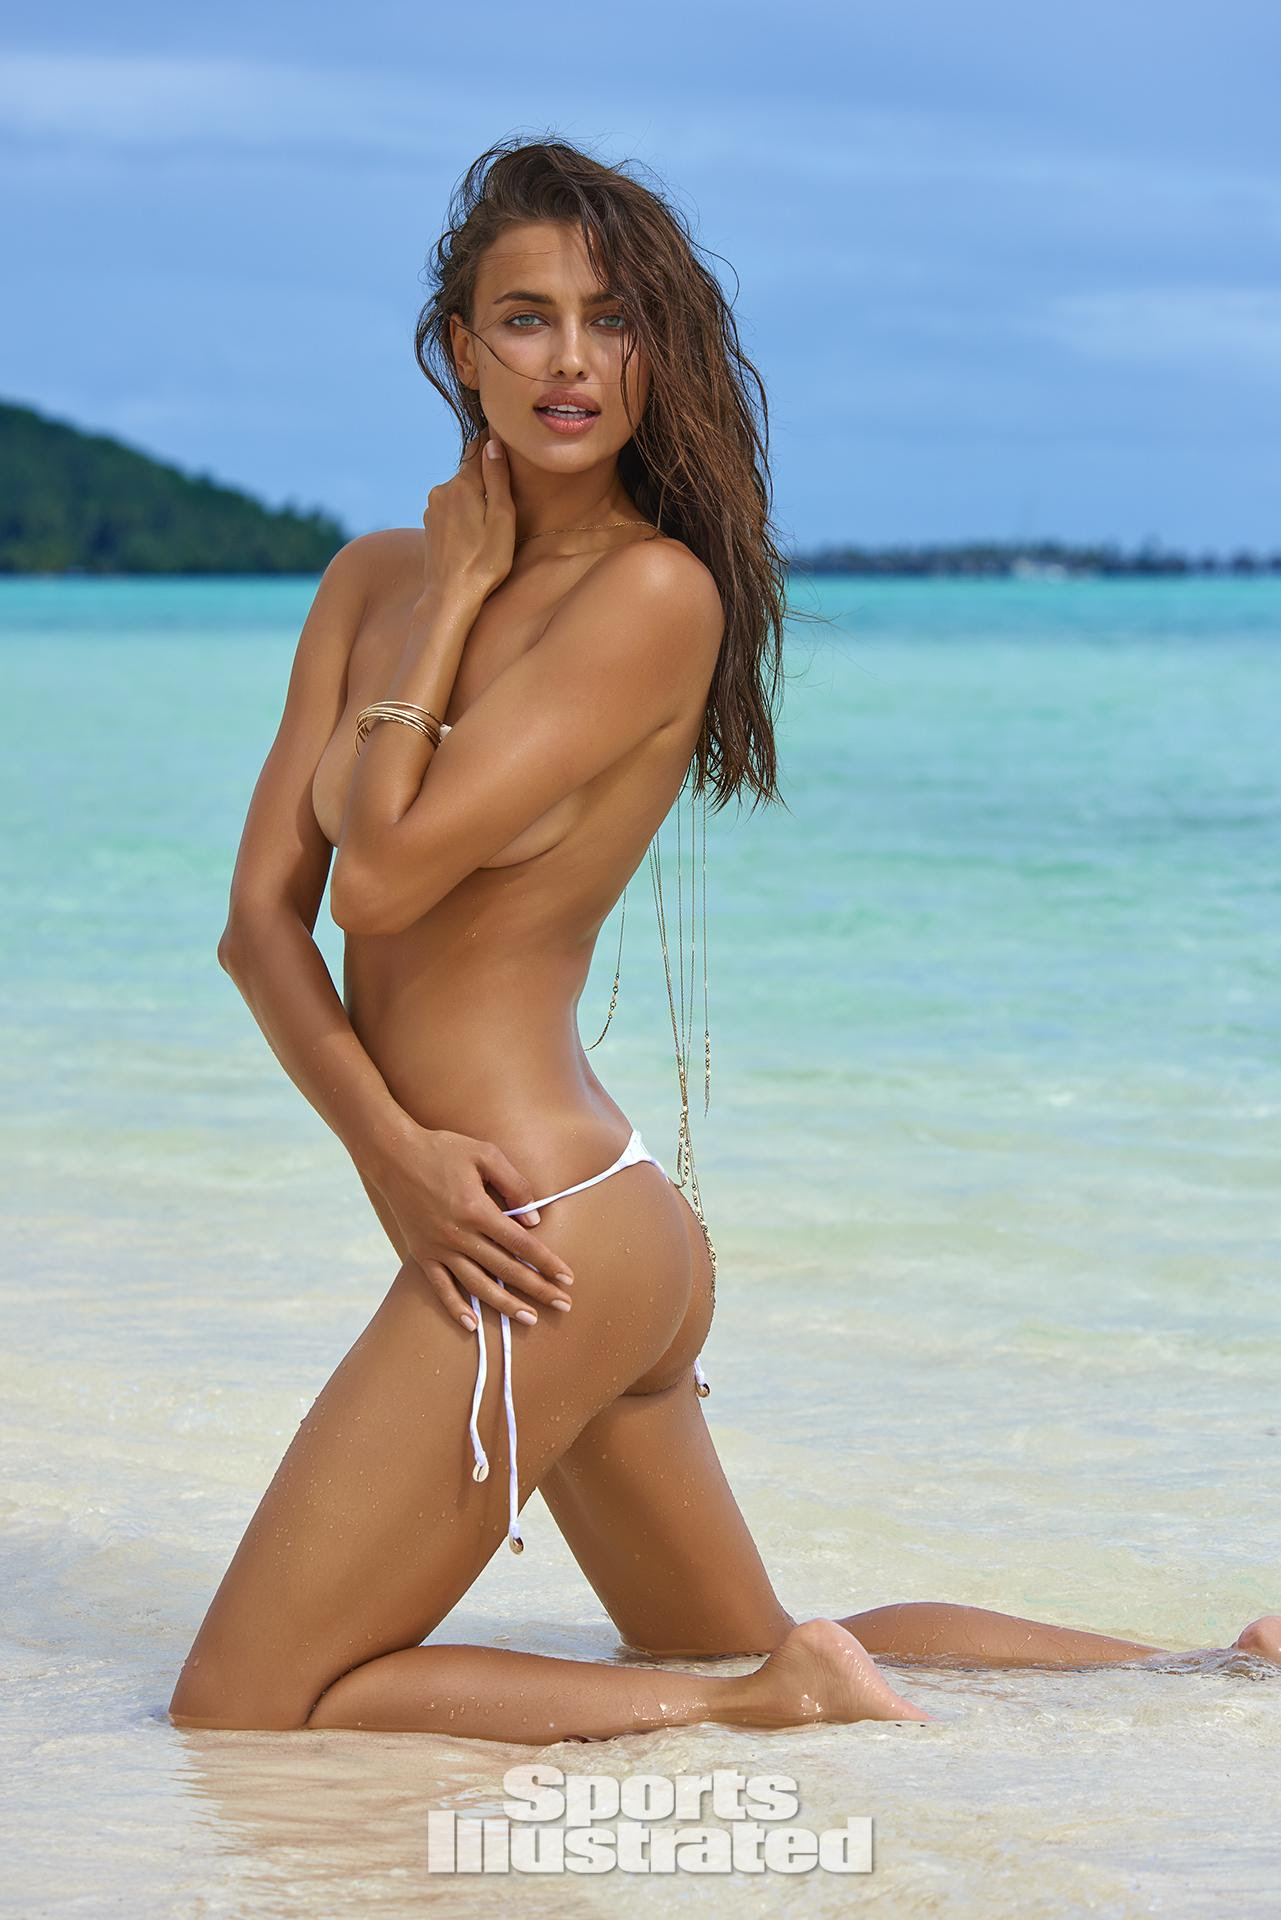 Girl bikini model sexy interview movies, hq nude movies